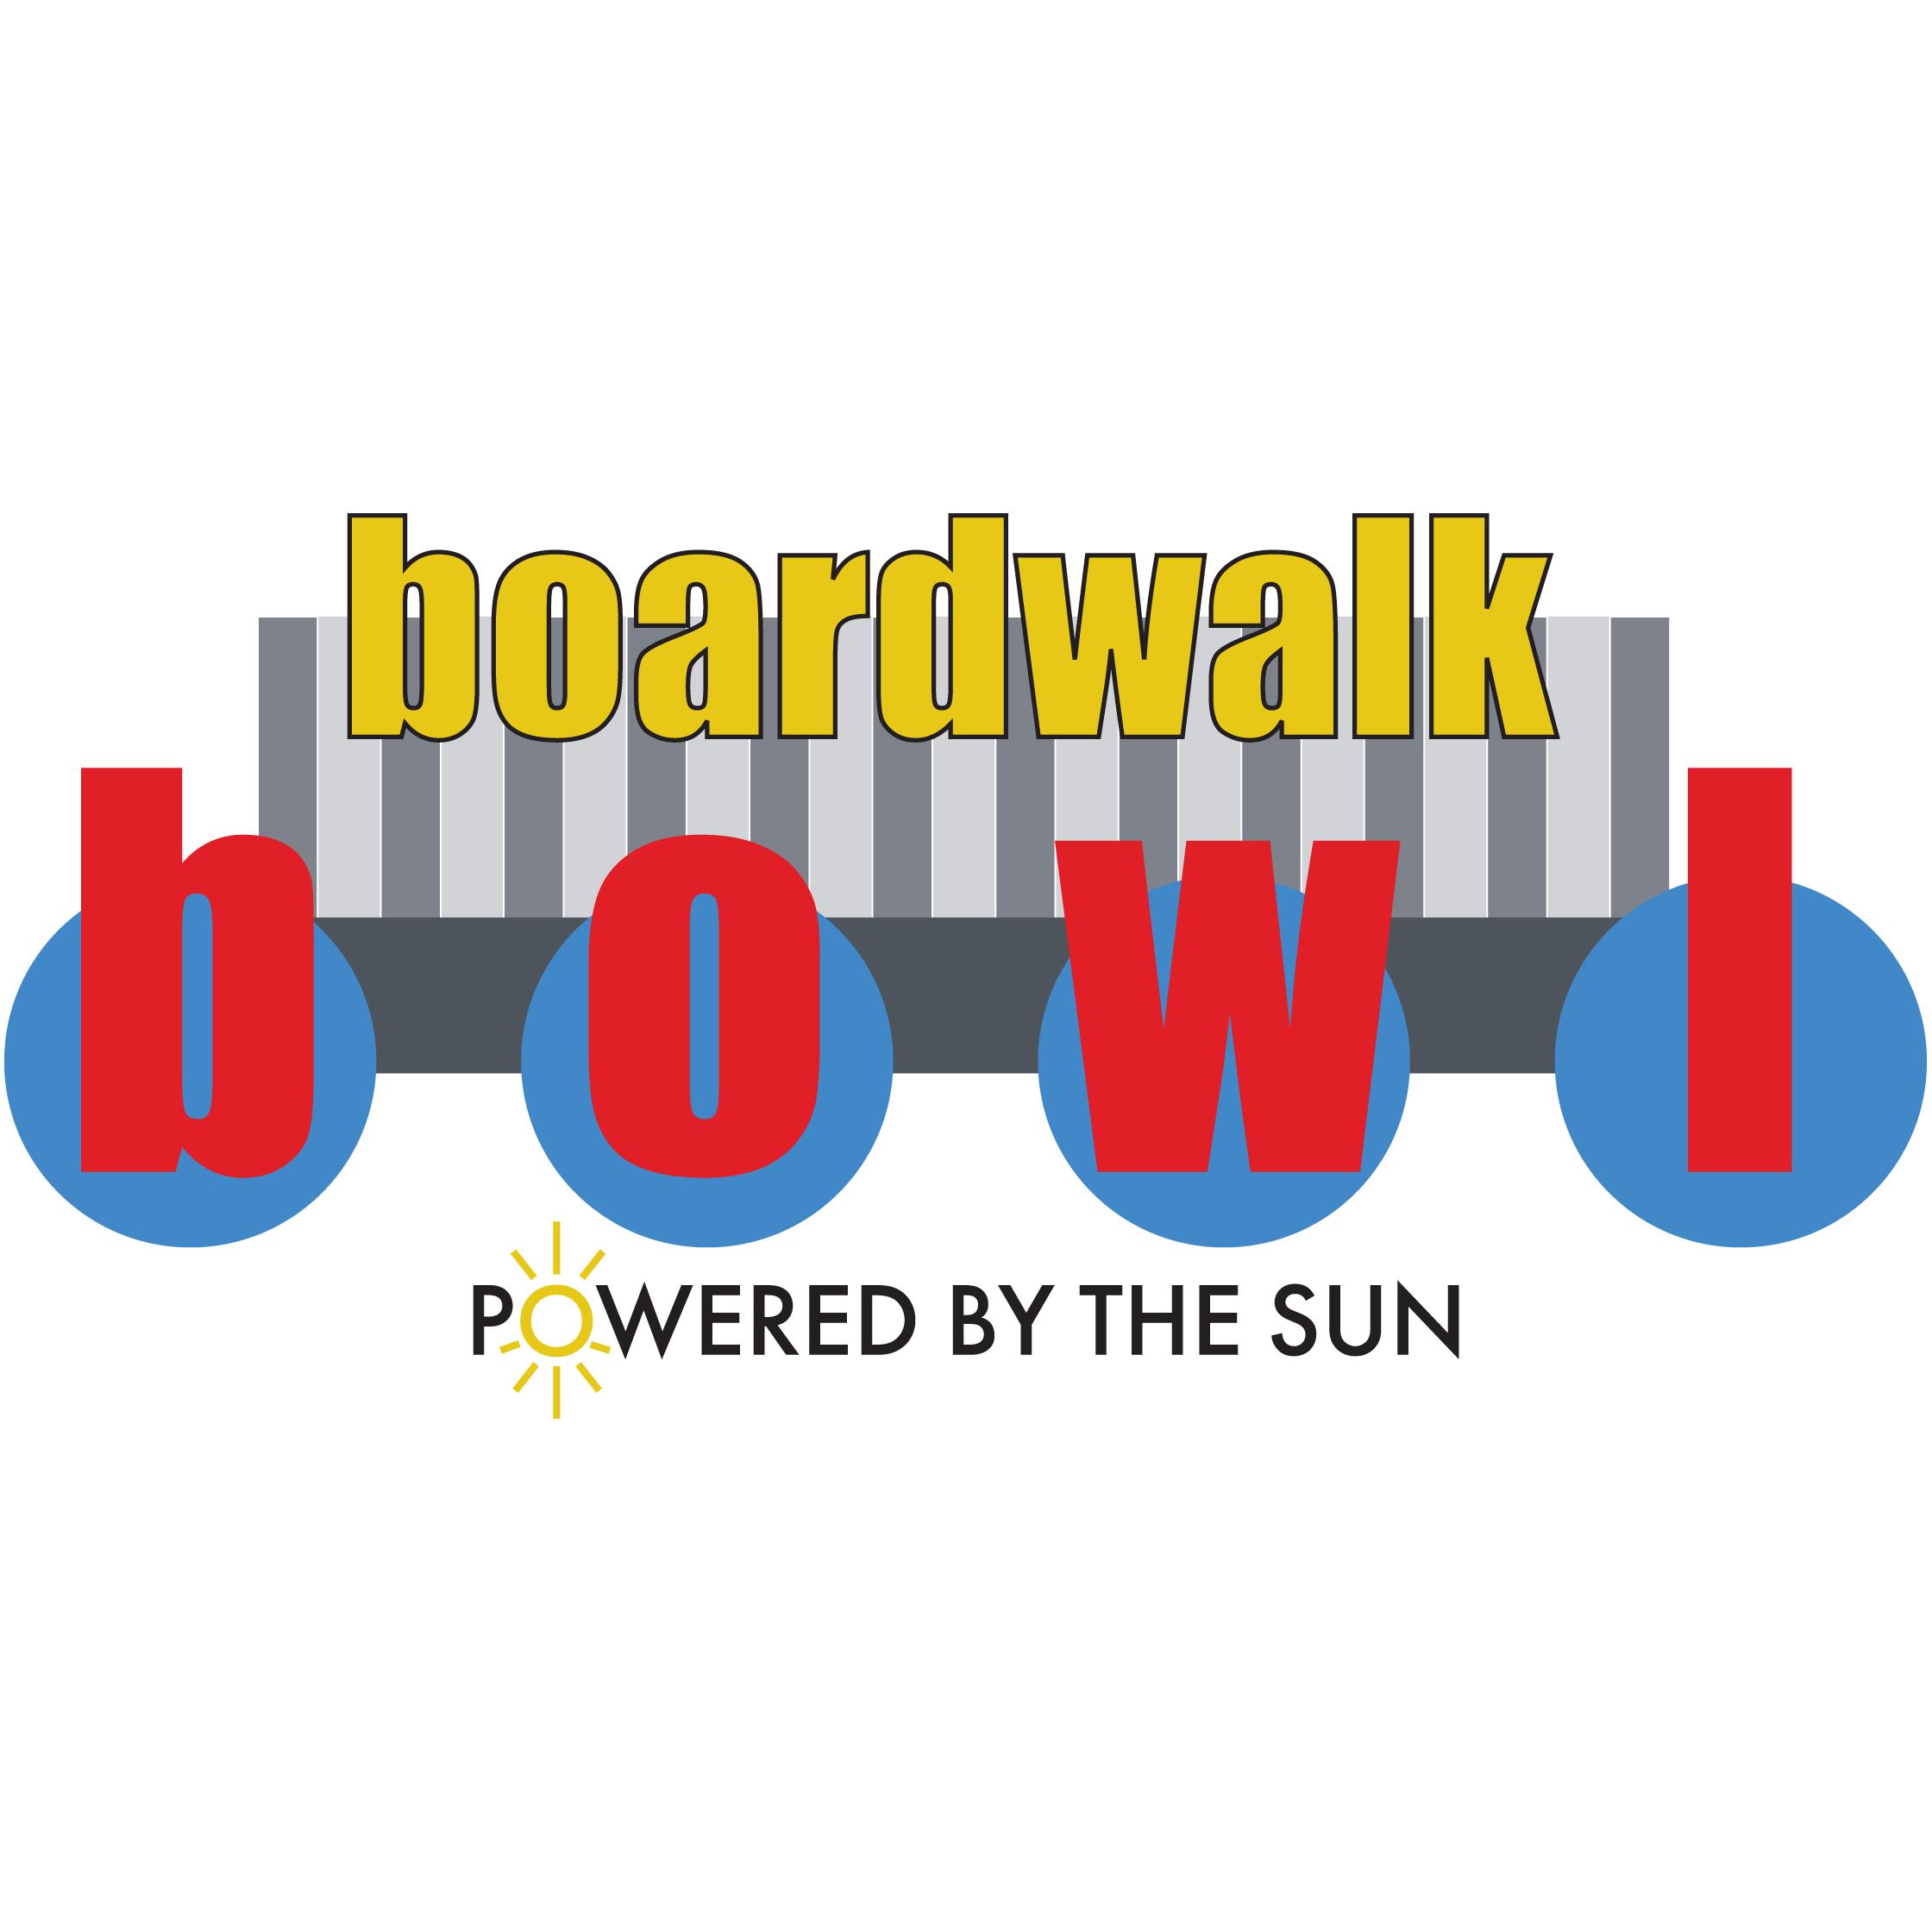 Boardwalk Bowl Entertainment Center